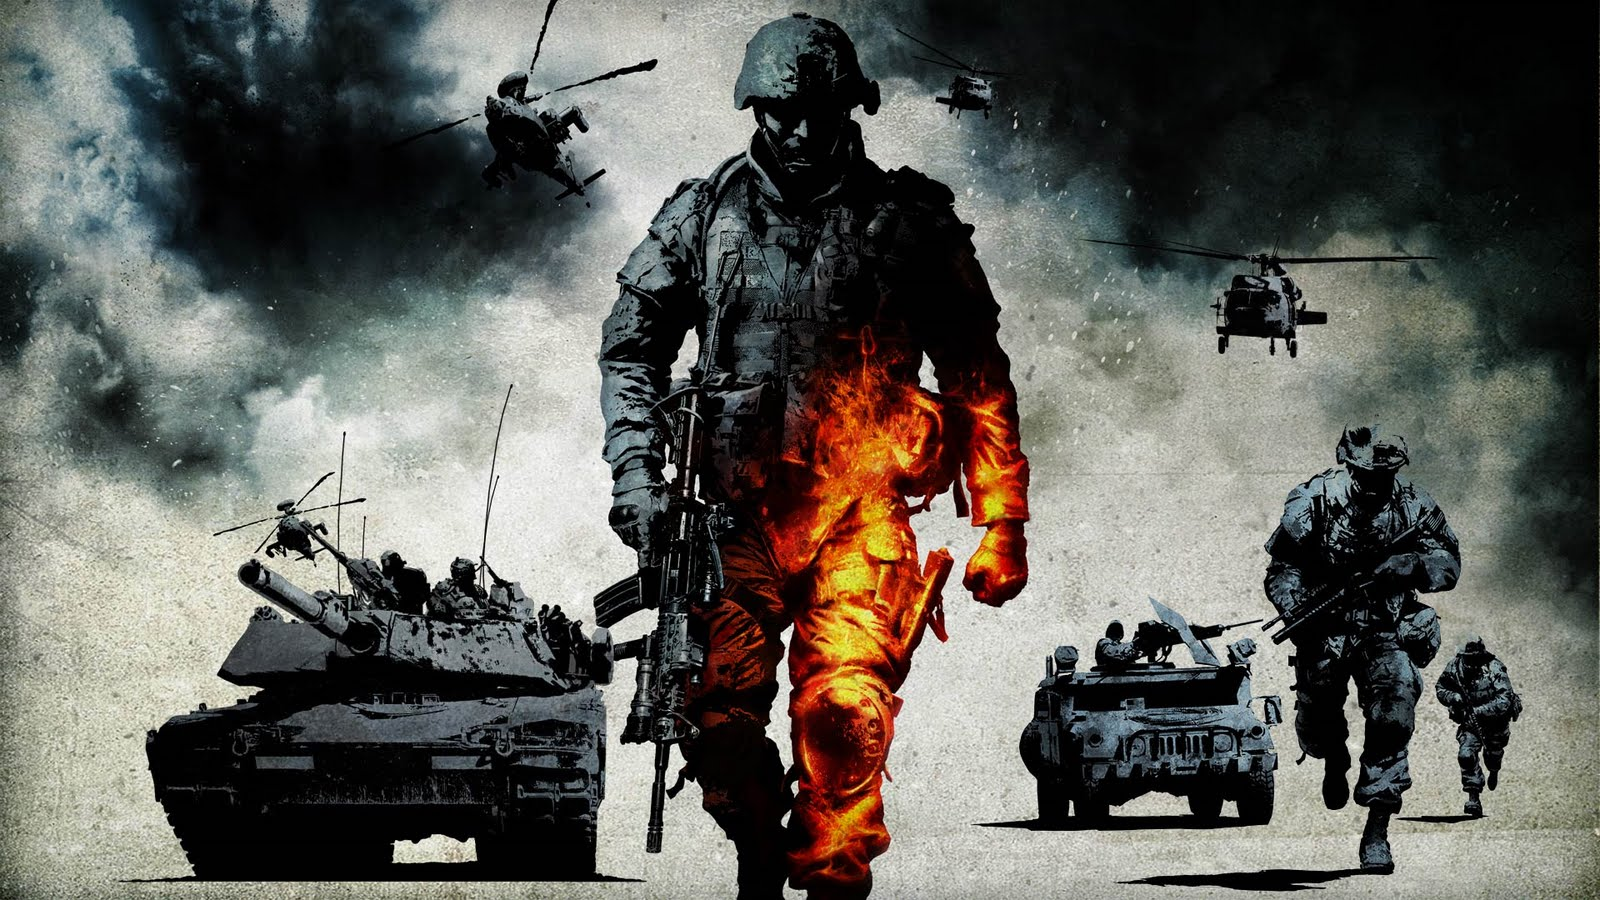 http://3.bp.blogspot.com/-PBmdT9g5jqc/TZgLXDy-TNI/AAAAAAAAIDY/ZIO3BBrHocM/s1600/Battlefield_Bad_Company_2_HD_Wallpapers_1.jpg